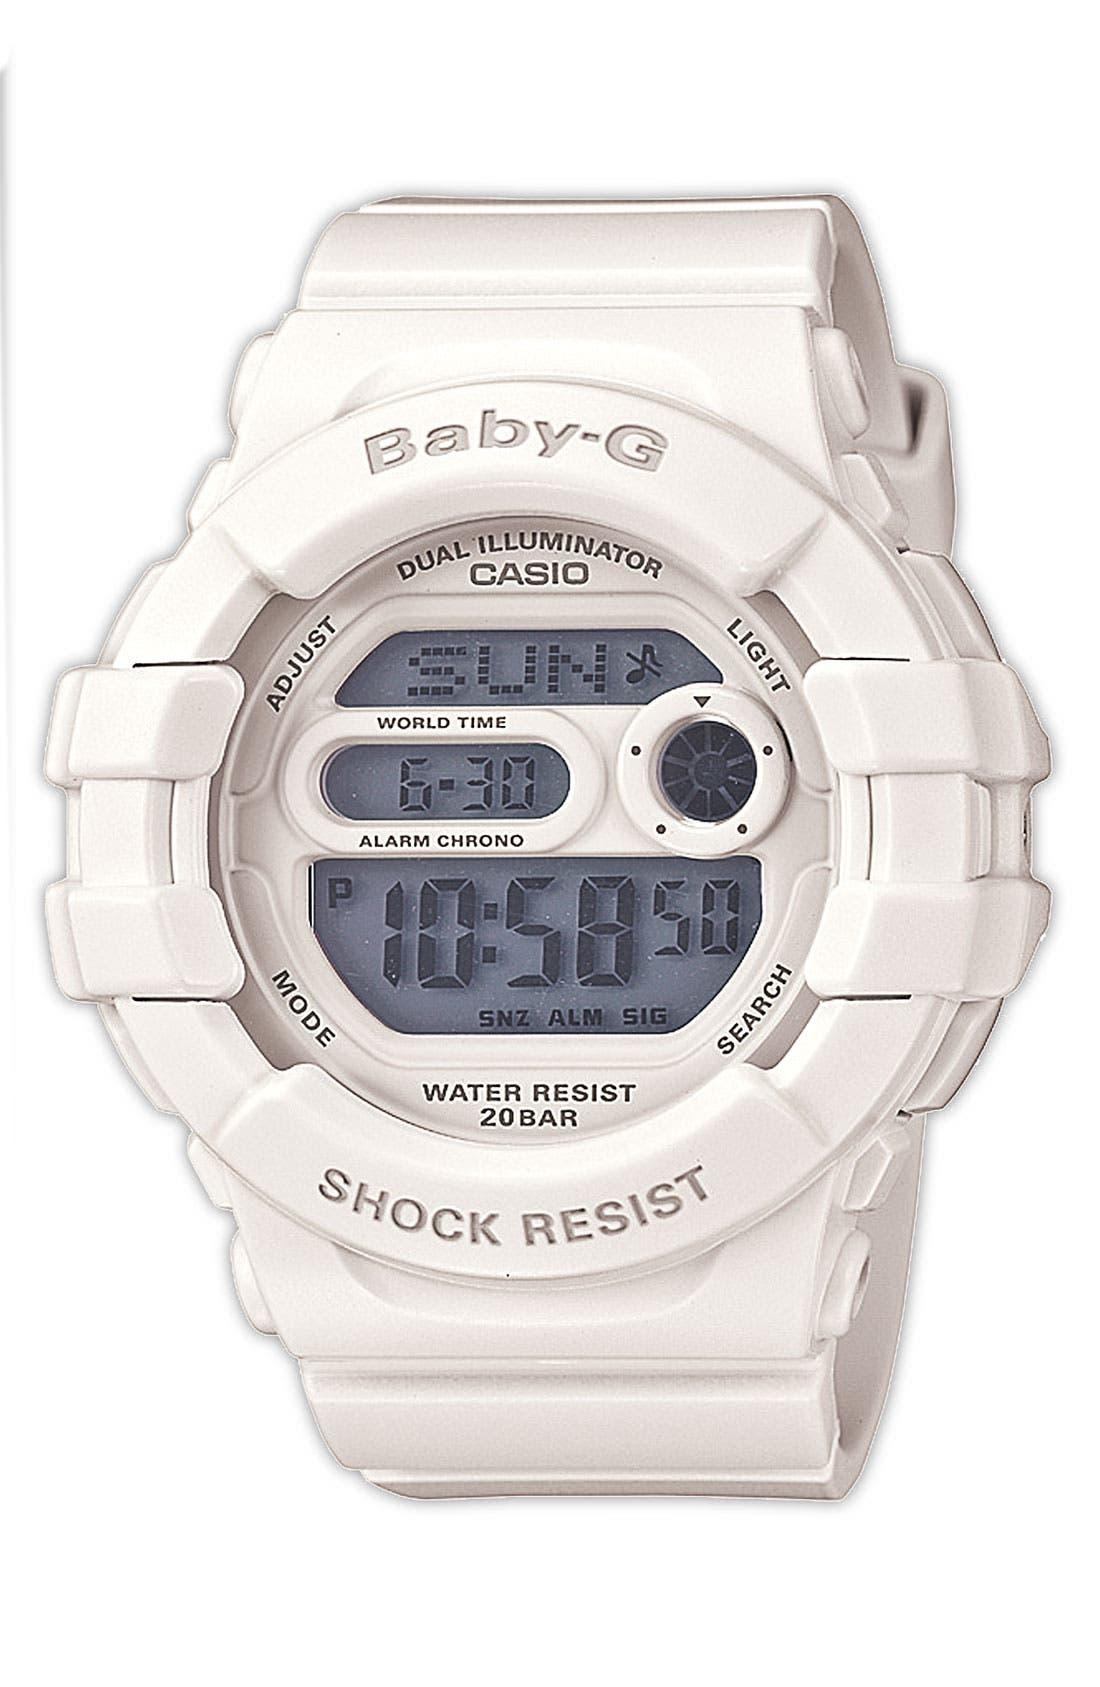 Main Image - Baby-G 'Dual Illuminator' Digital Watch, 42mm